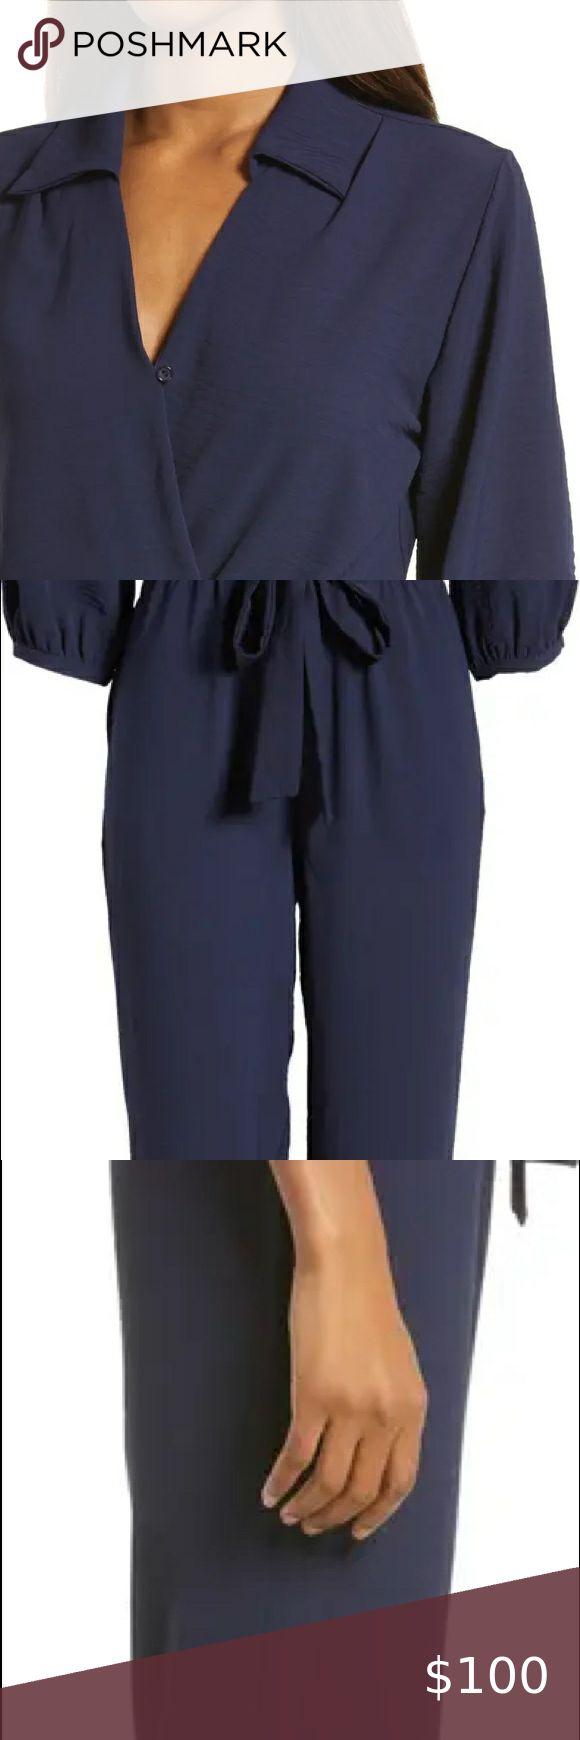 Casual simple contrast color jumpsuit slim slimming halter